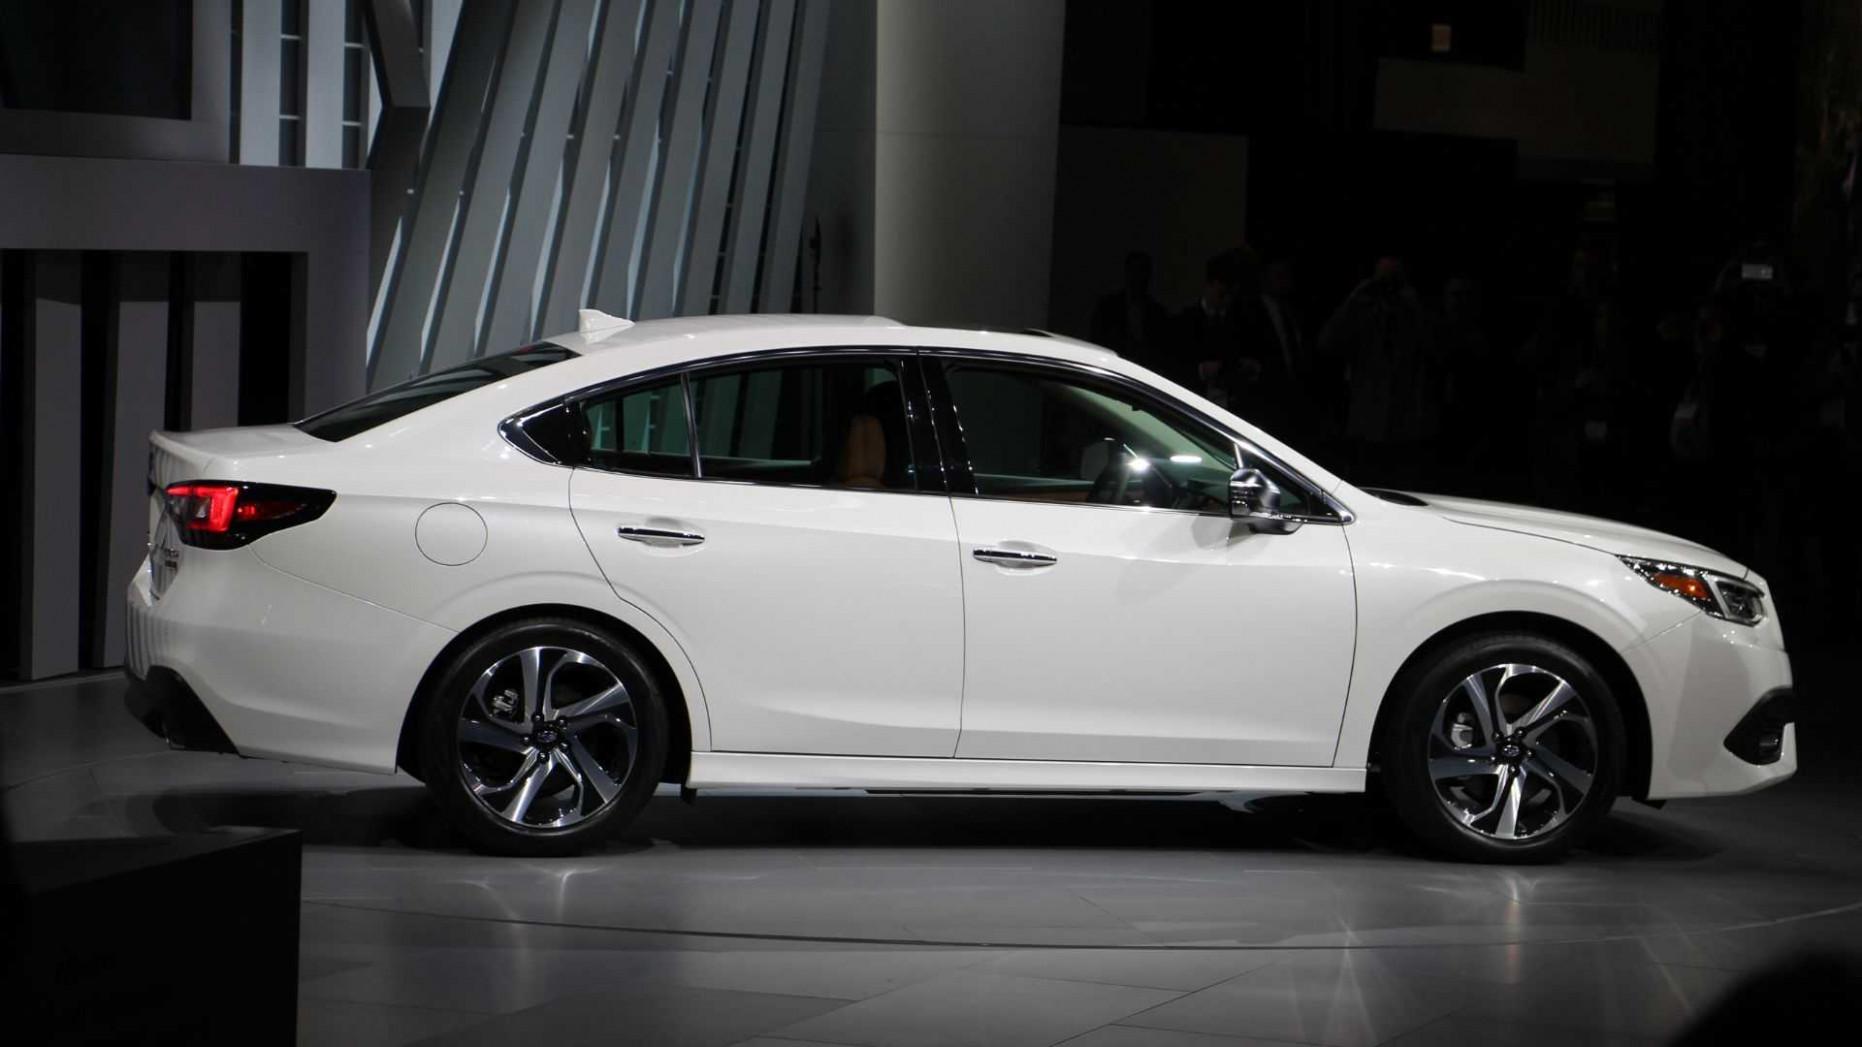 Pricing 2022 Subaru Legacy Turbo